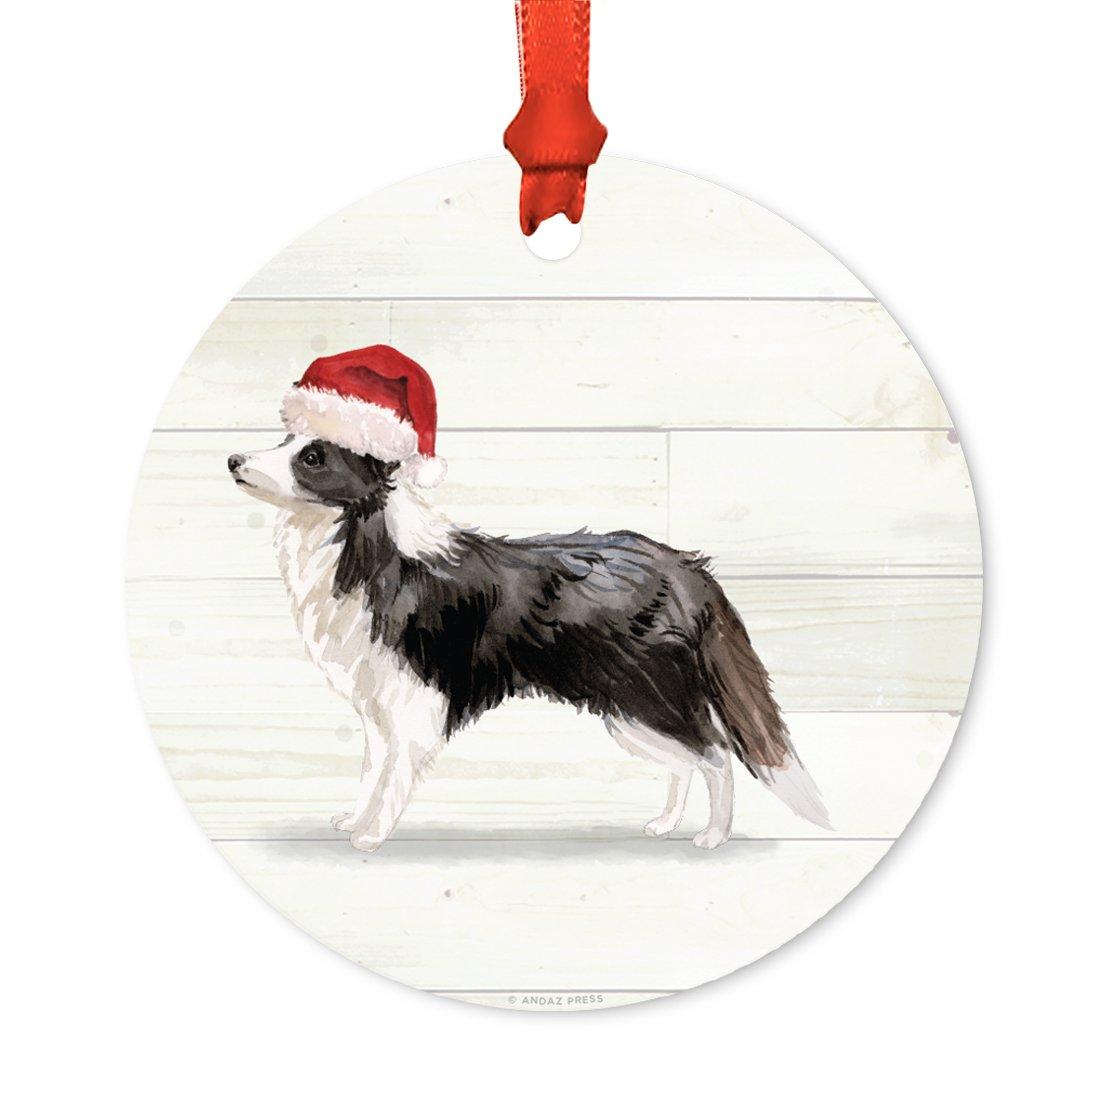 Tan Dachshund with Santa Hat Andaz Press Animal Pet Dog Metal Christmas Ornament 1-Pack Includes Ribbon and Gift Bag